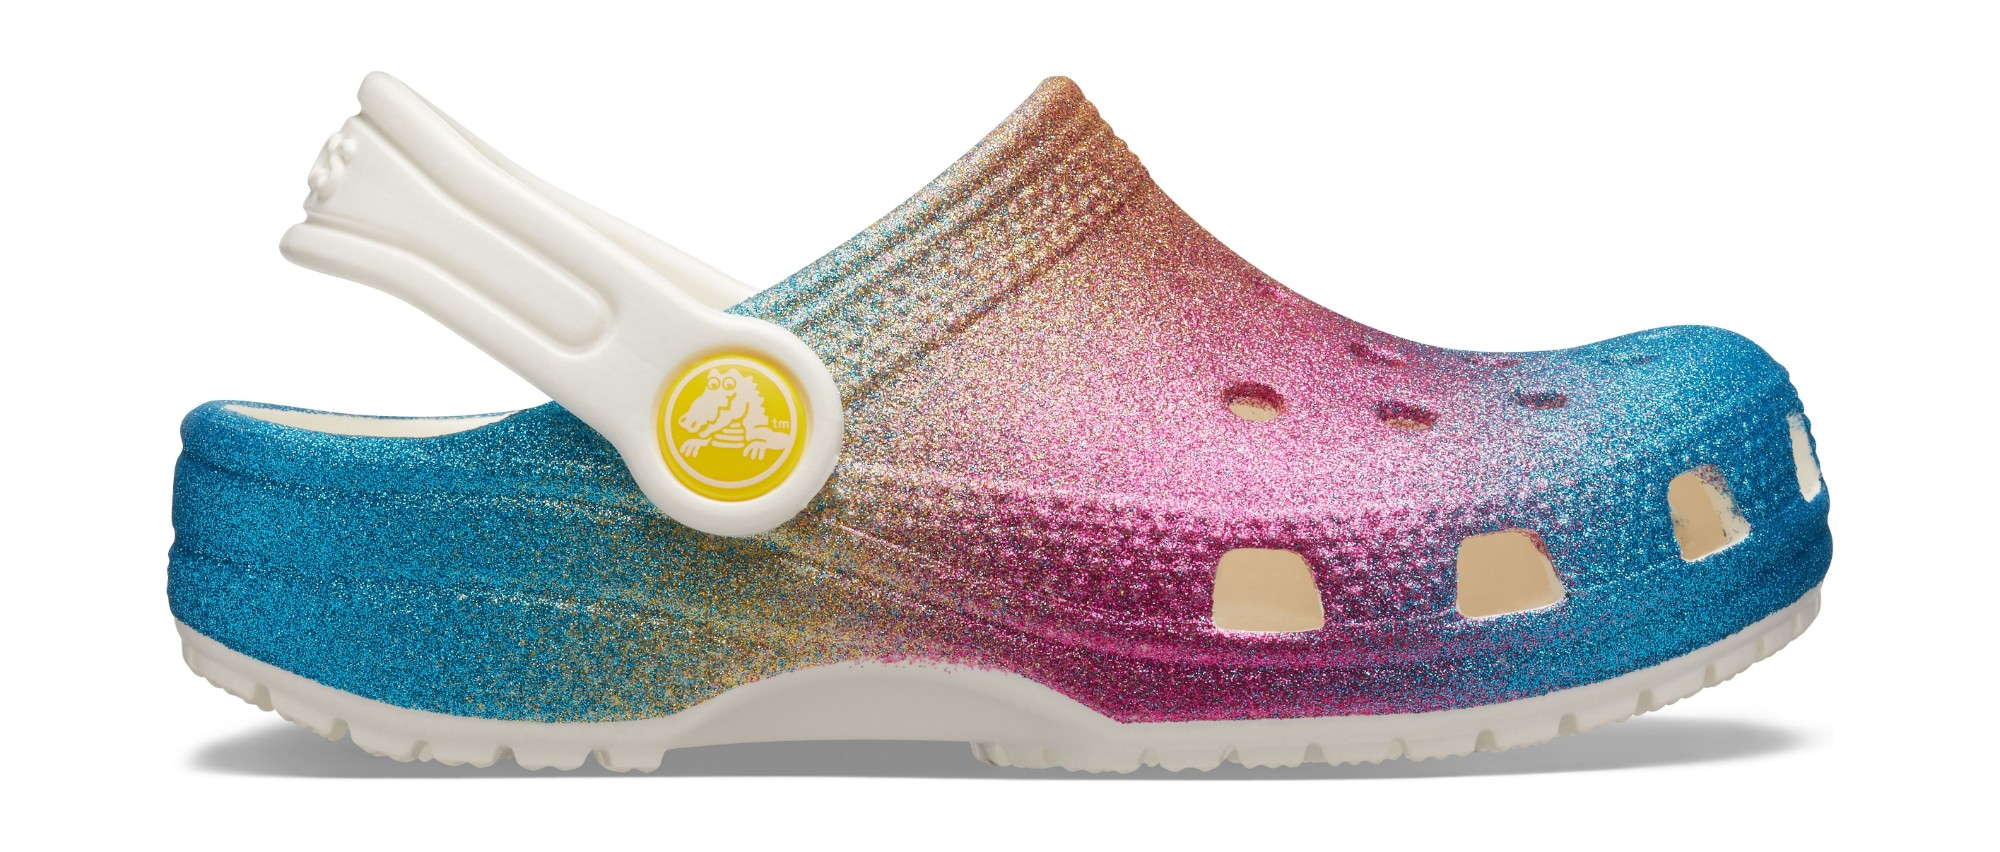 Crocs™ Classic Ombre Glitter Clog Kids Oyster/Multi 28